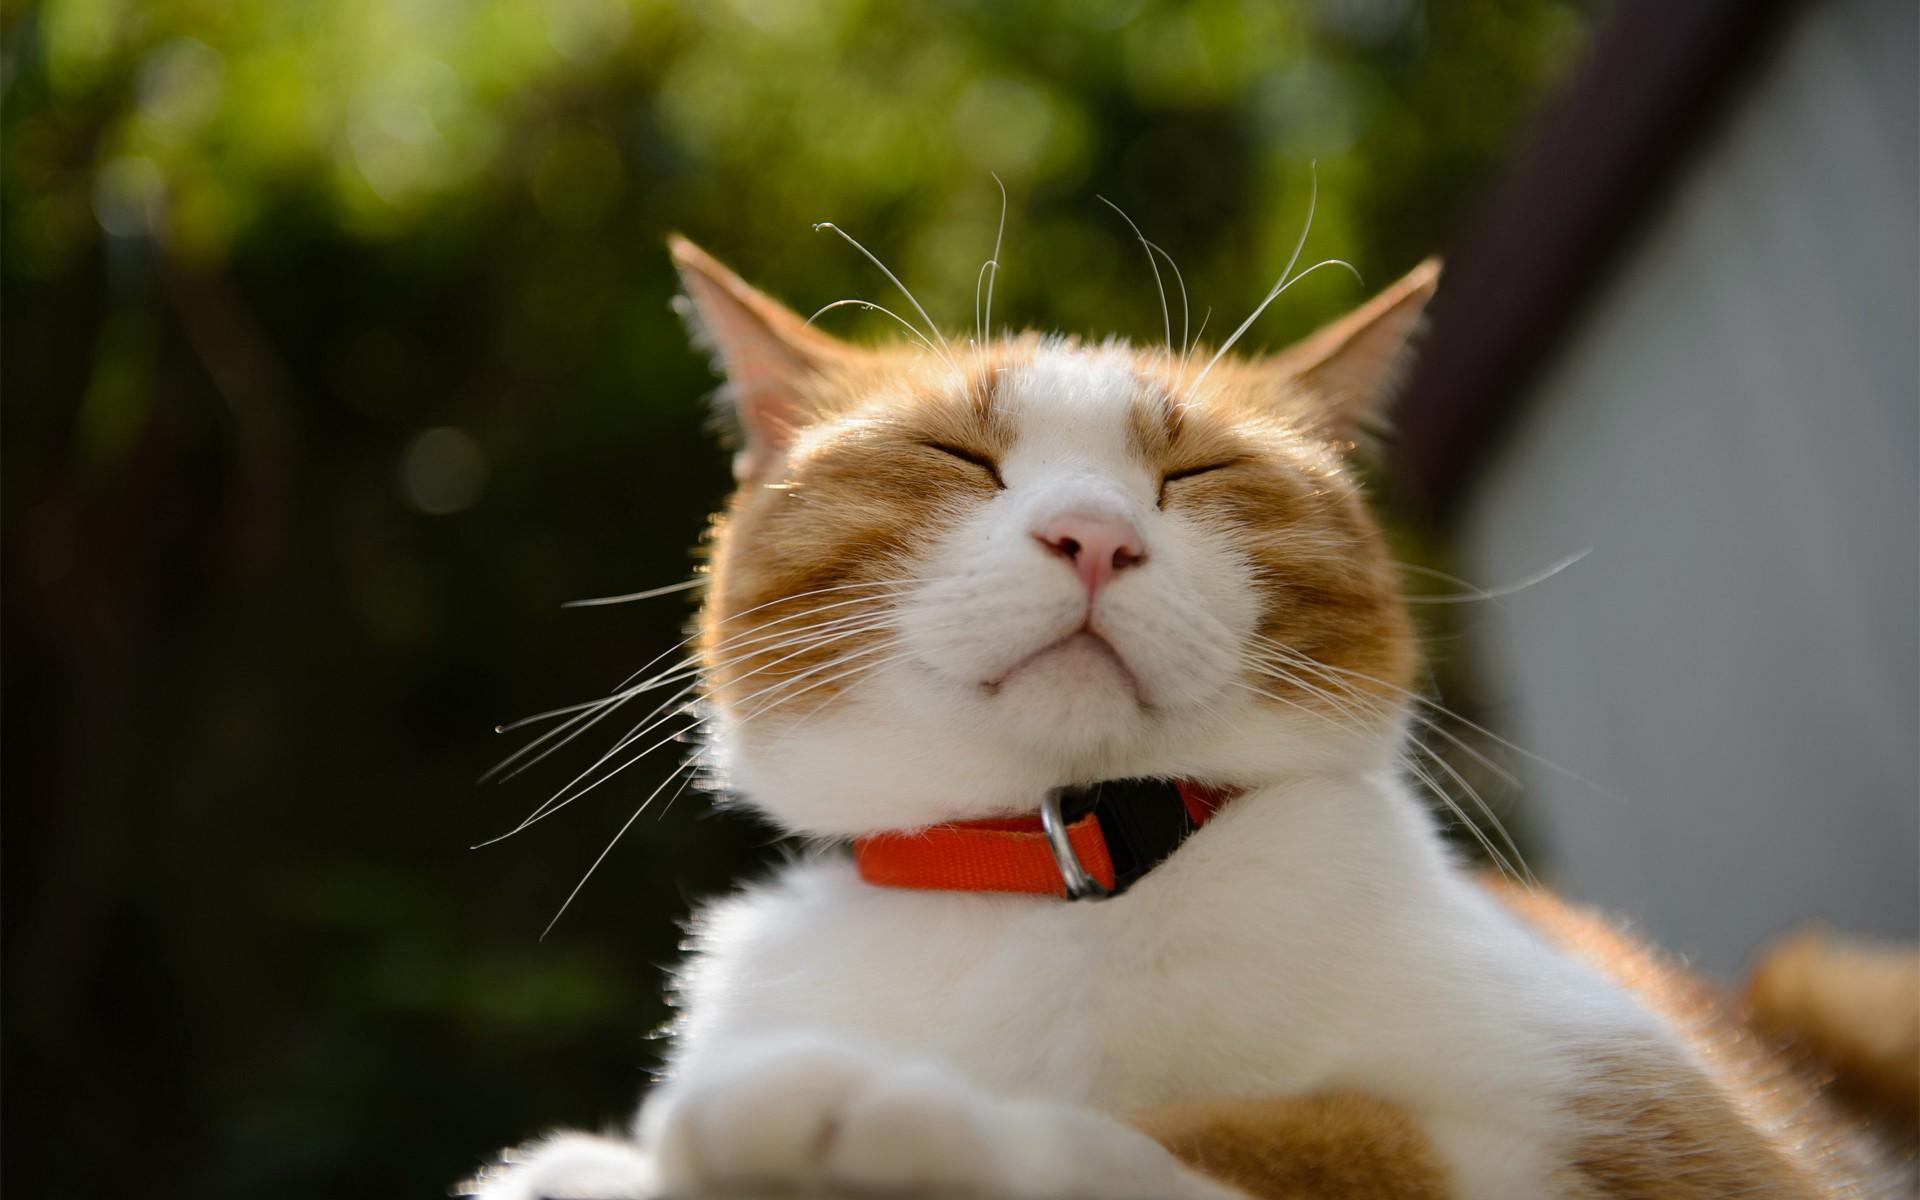 Un gato risueño - 1920x1200